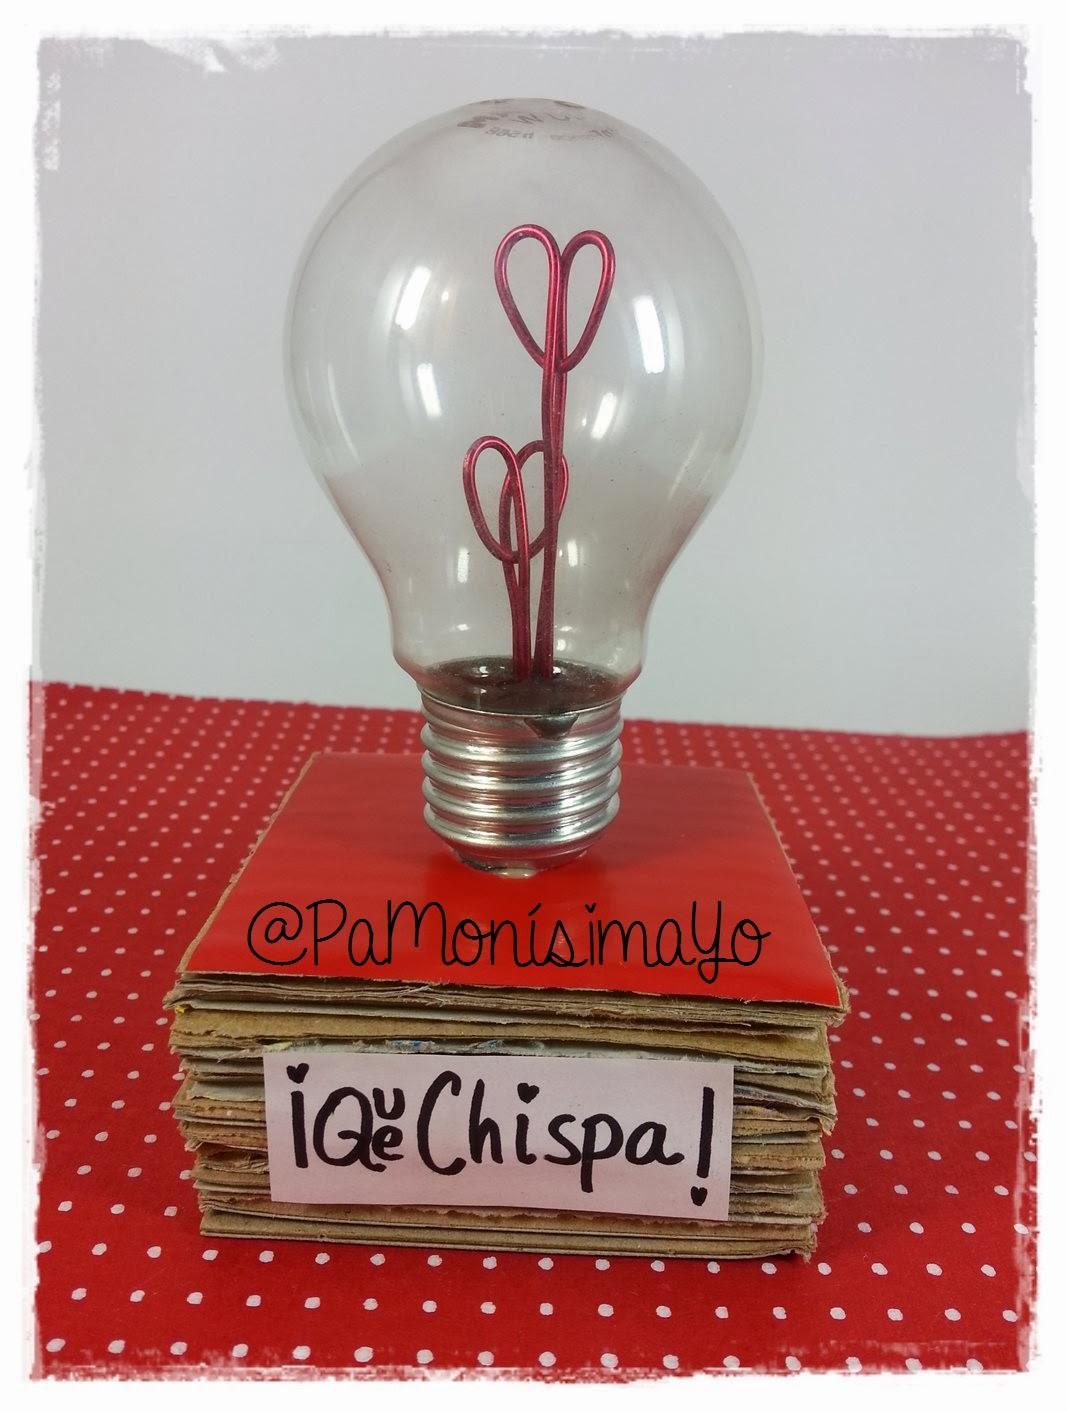 Recicla una bombilla para San Valentín @pamonisimayo